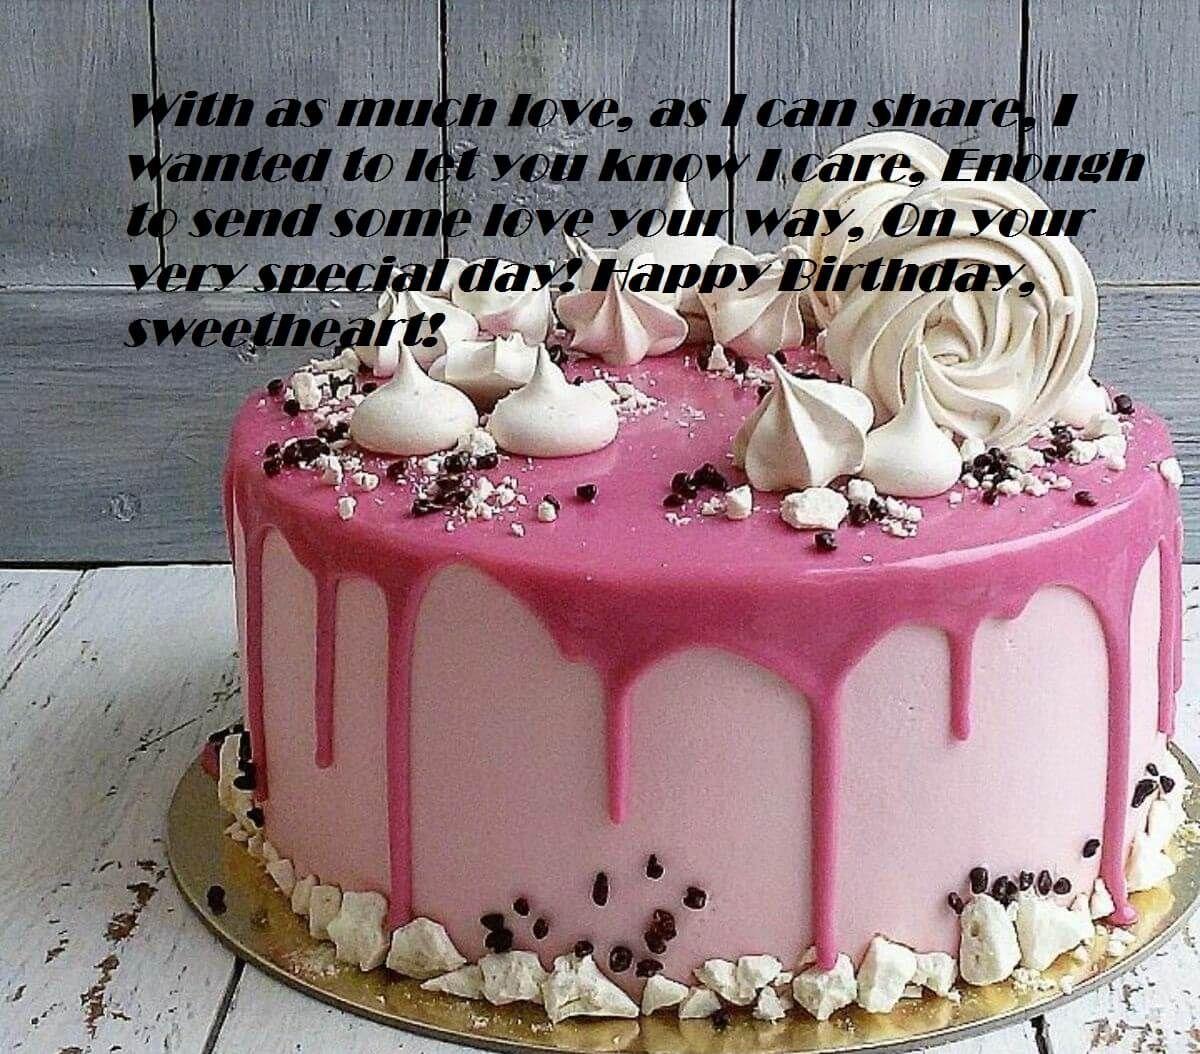 Happy Birthday Wishes Cake For Her Birthday Wishes Pinterest